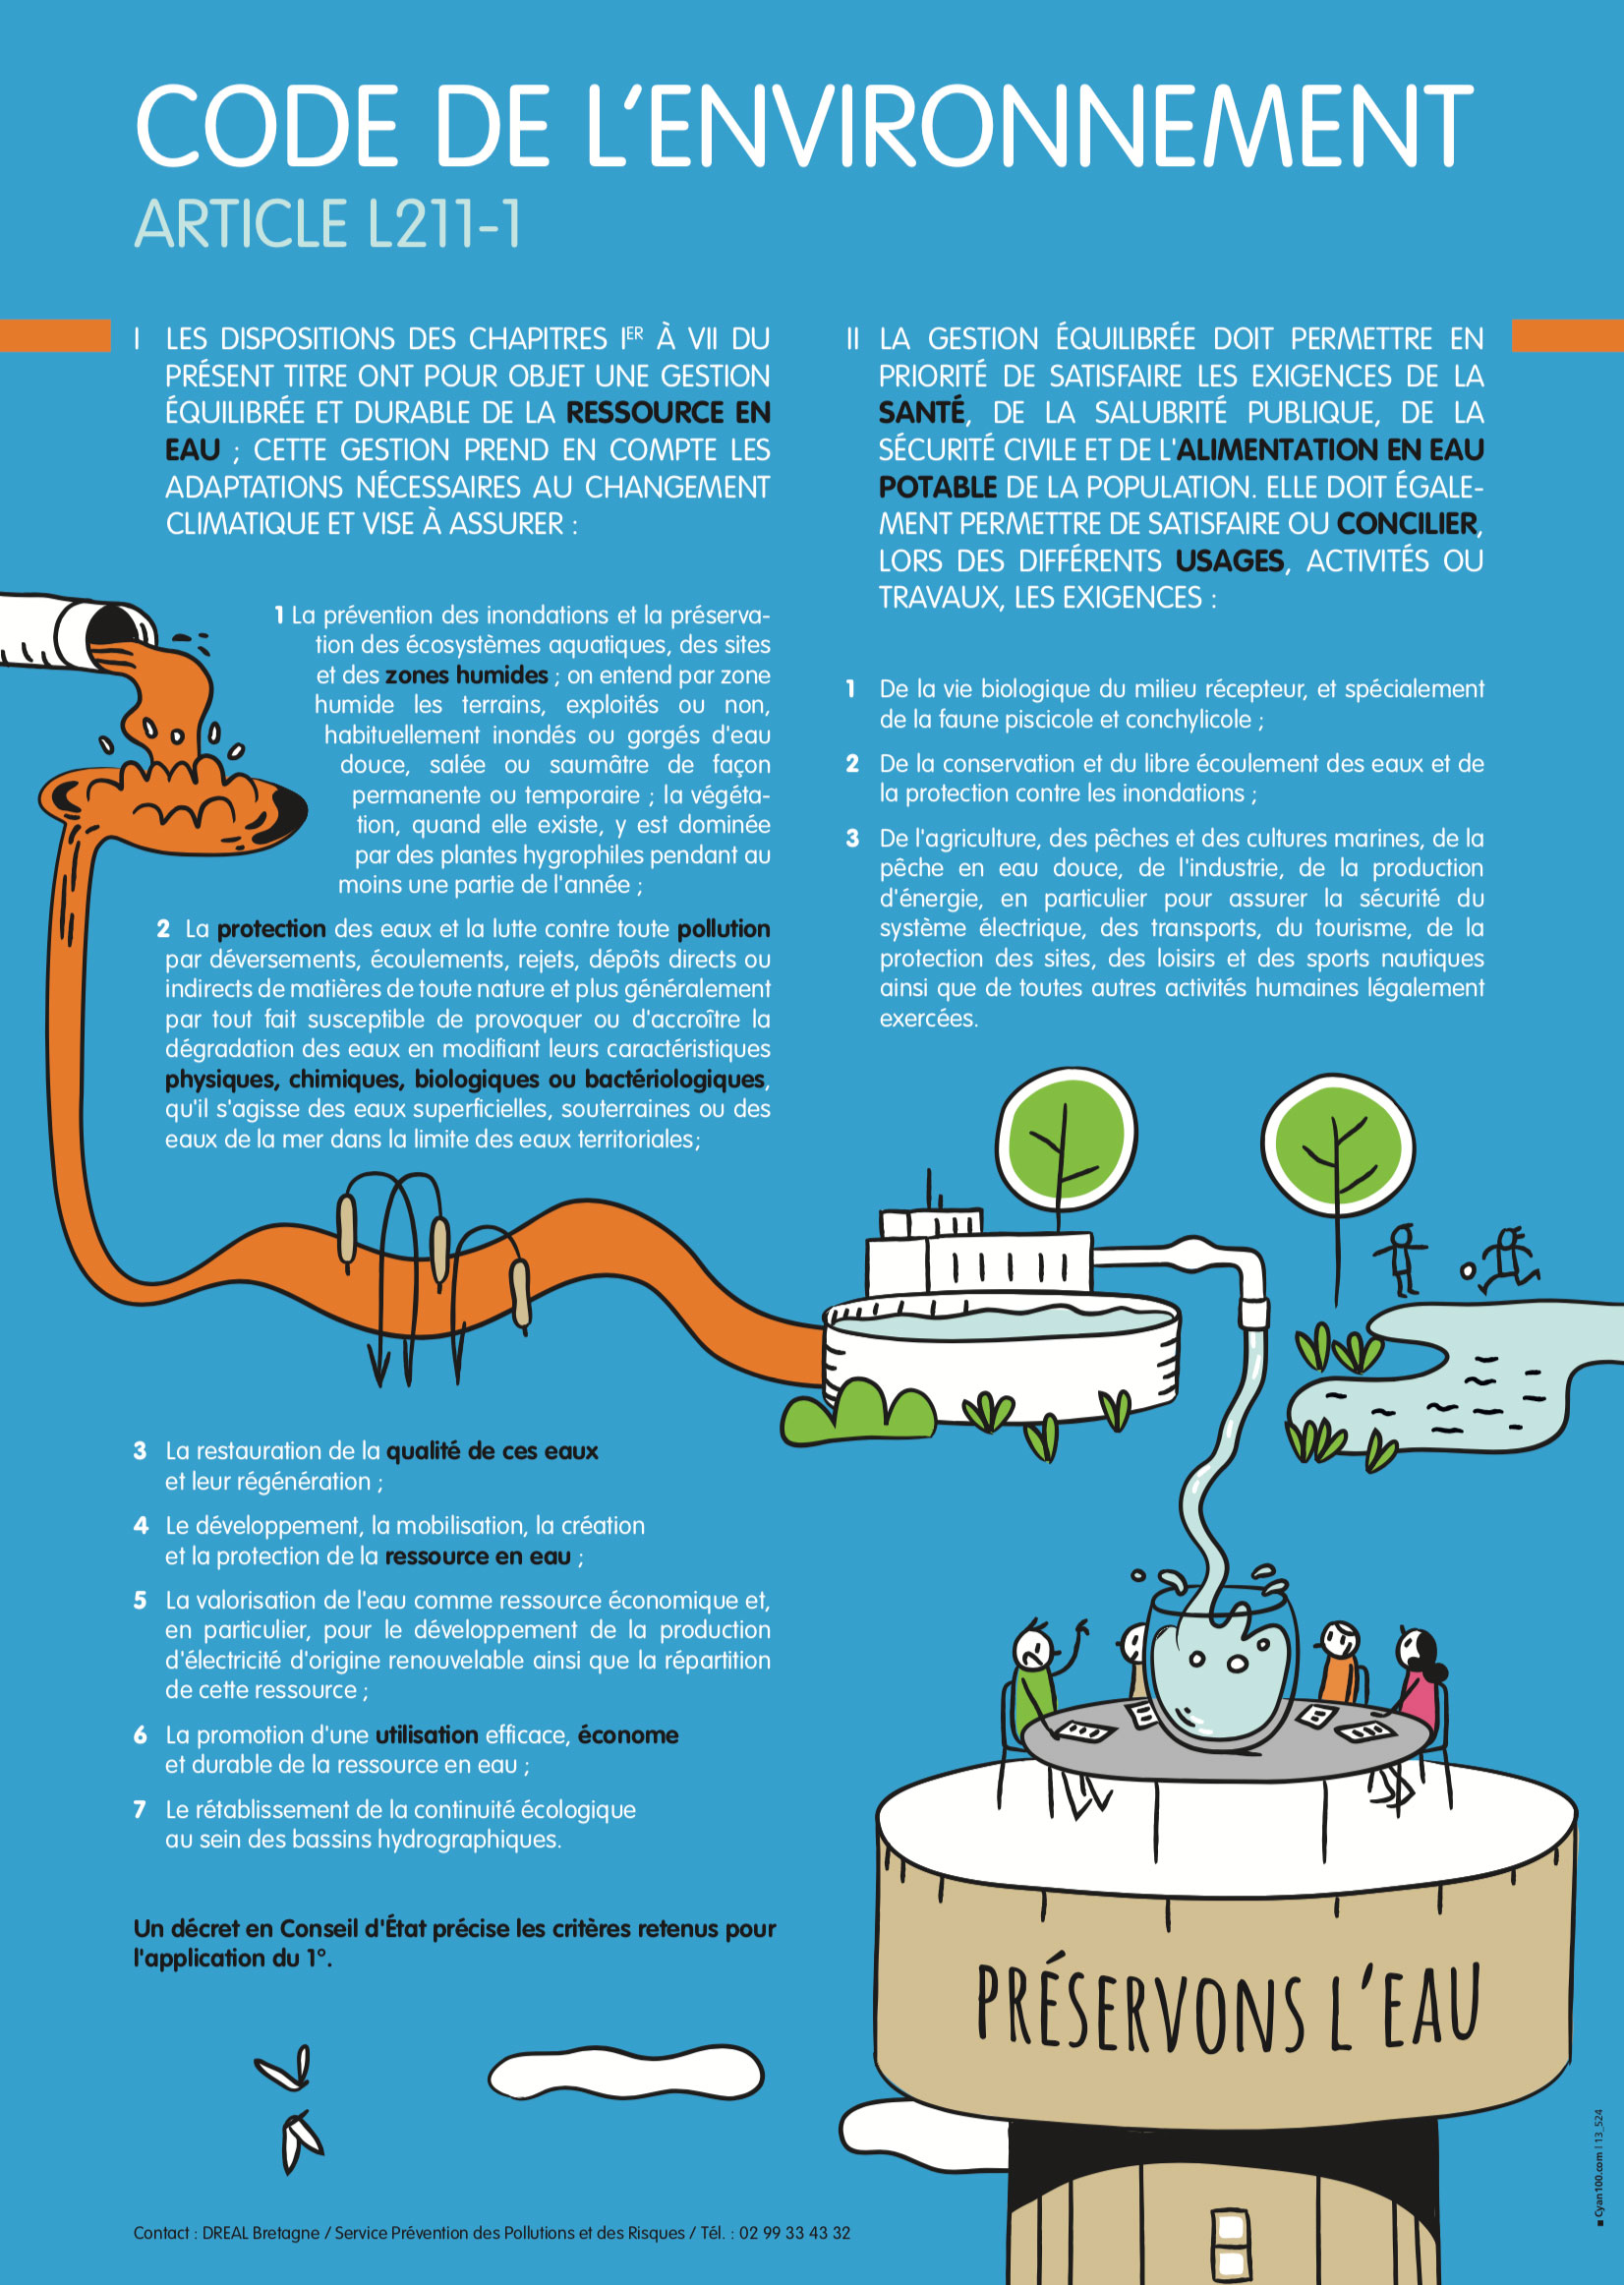 Dreal Bretagne Affiche Code Environnement